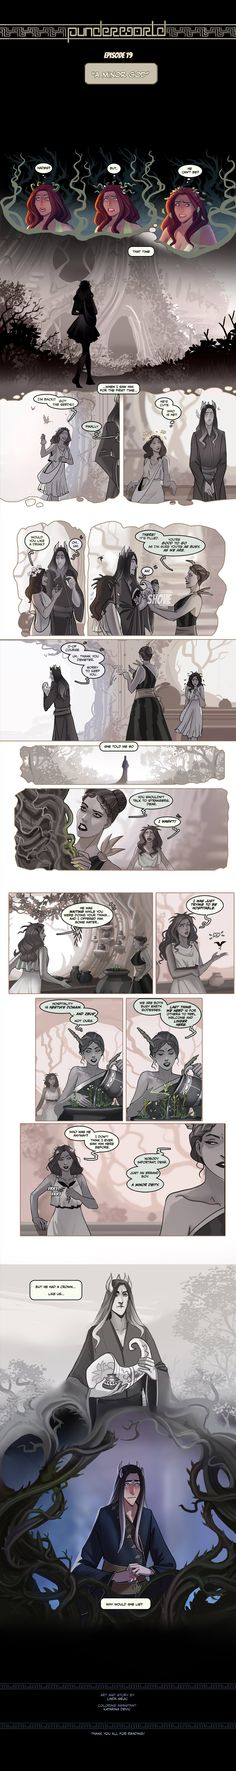 Comics Story, Fun Comics, Greek Mythology Humor, Supernatural Drawings, Hades And Persephone, Horror Comics, Comic Panels, Greek Gods, Easy Paintings